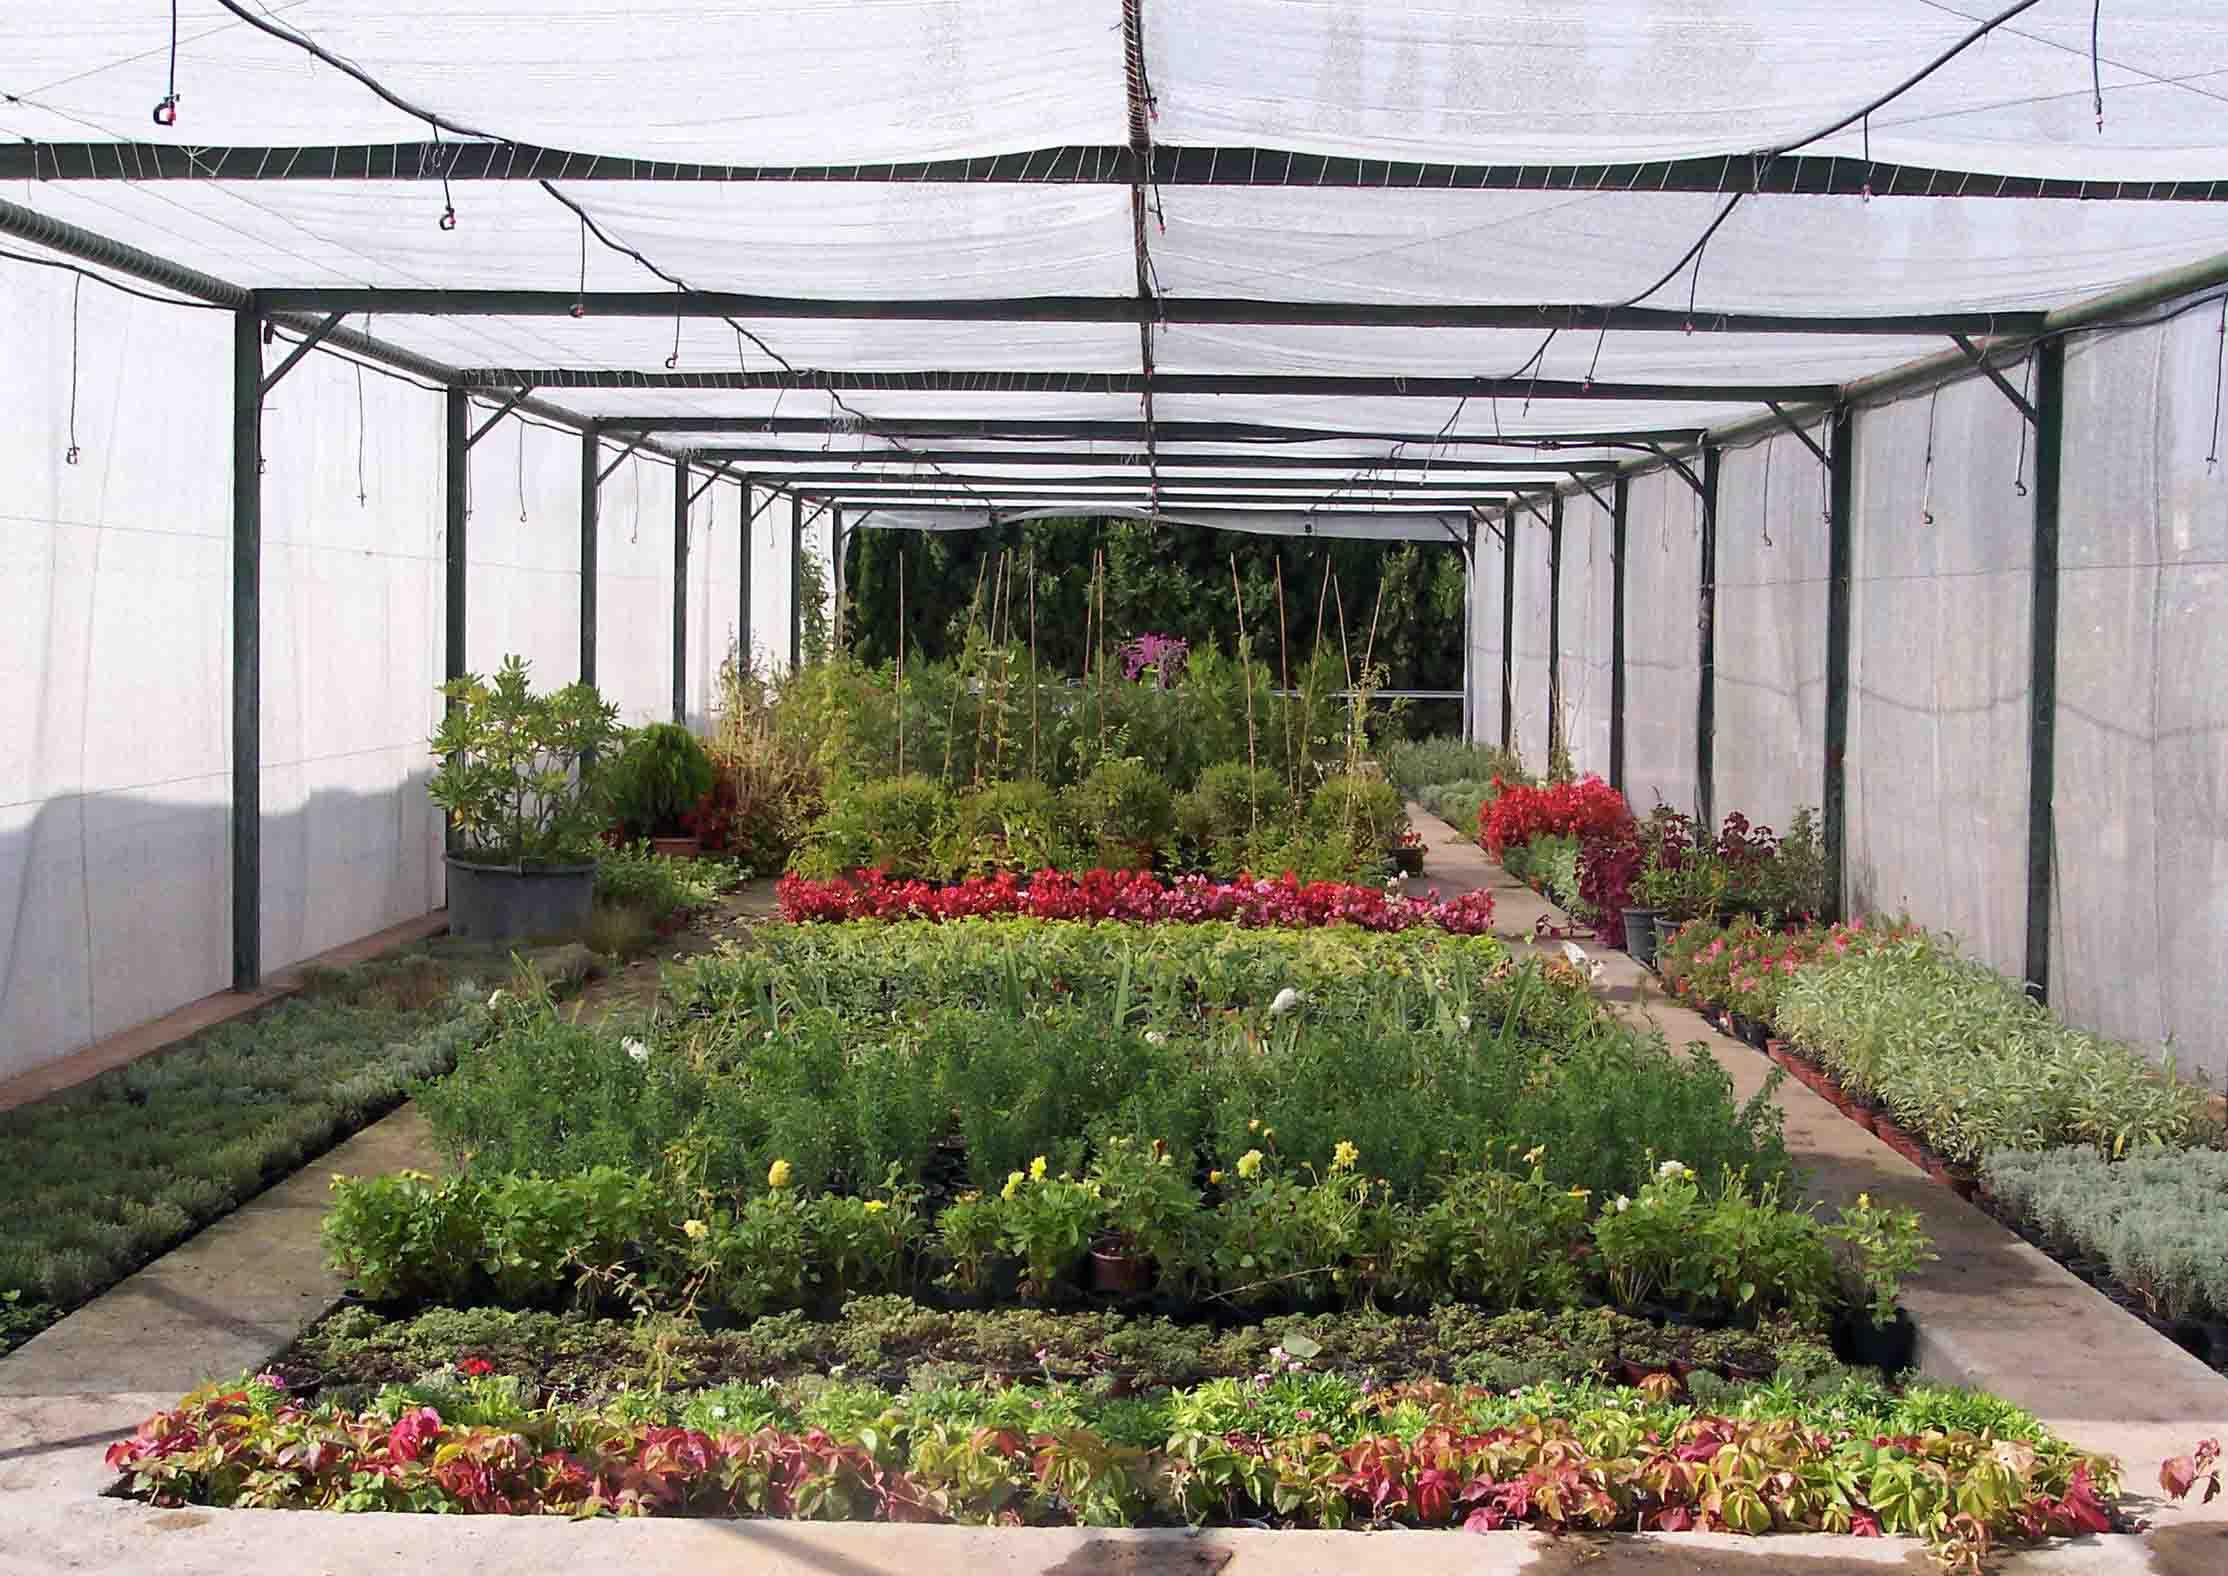 Ilba jardiner a - Centros de jardineria madrid ...